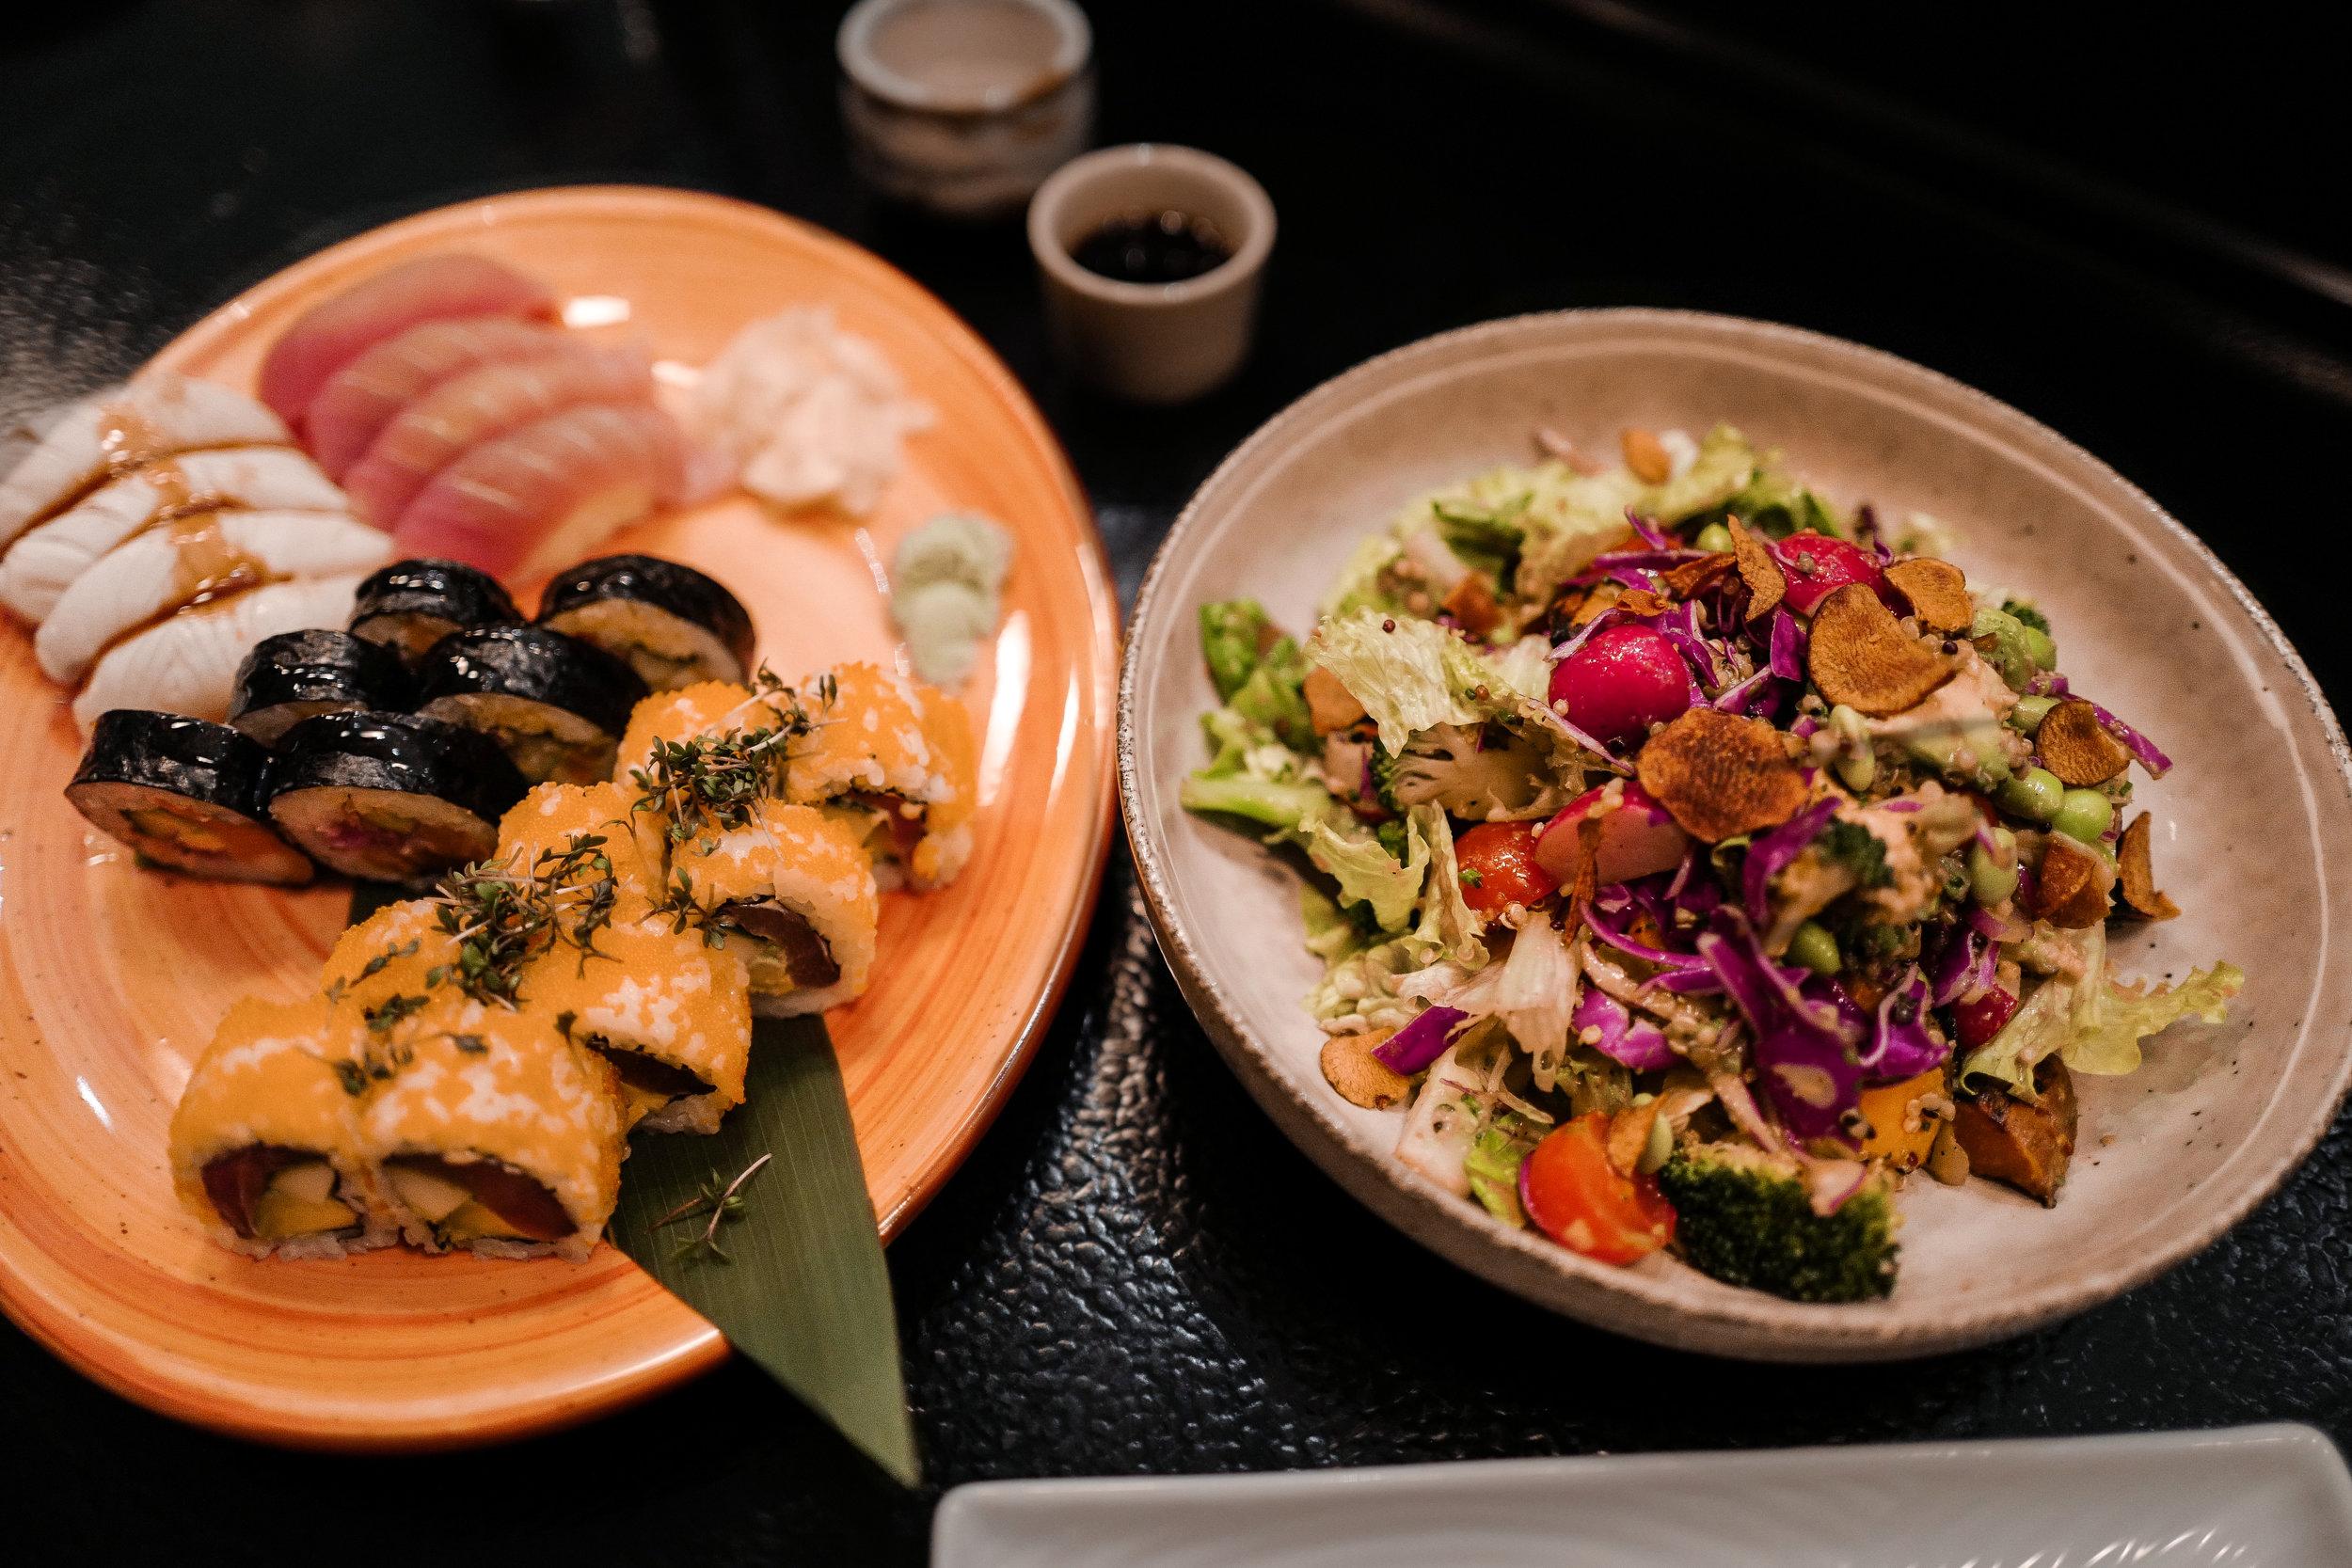 We found a new favorite sushi place - Sticks n Sushi in Copenhagen